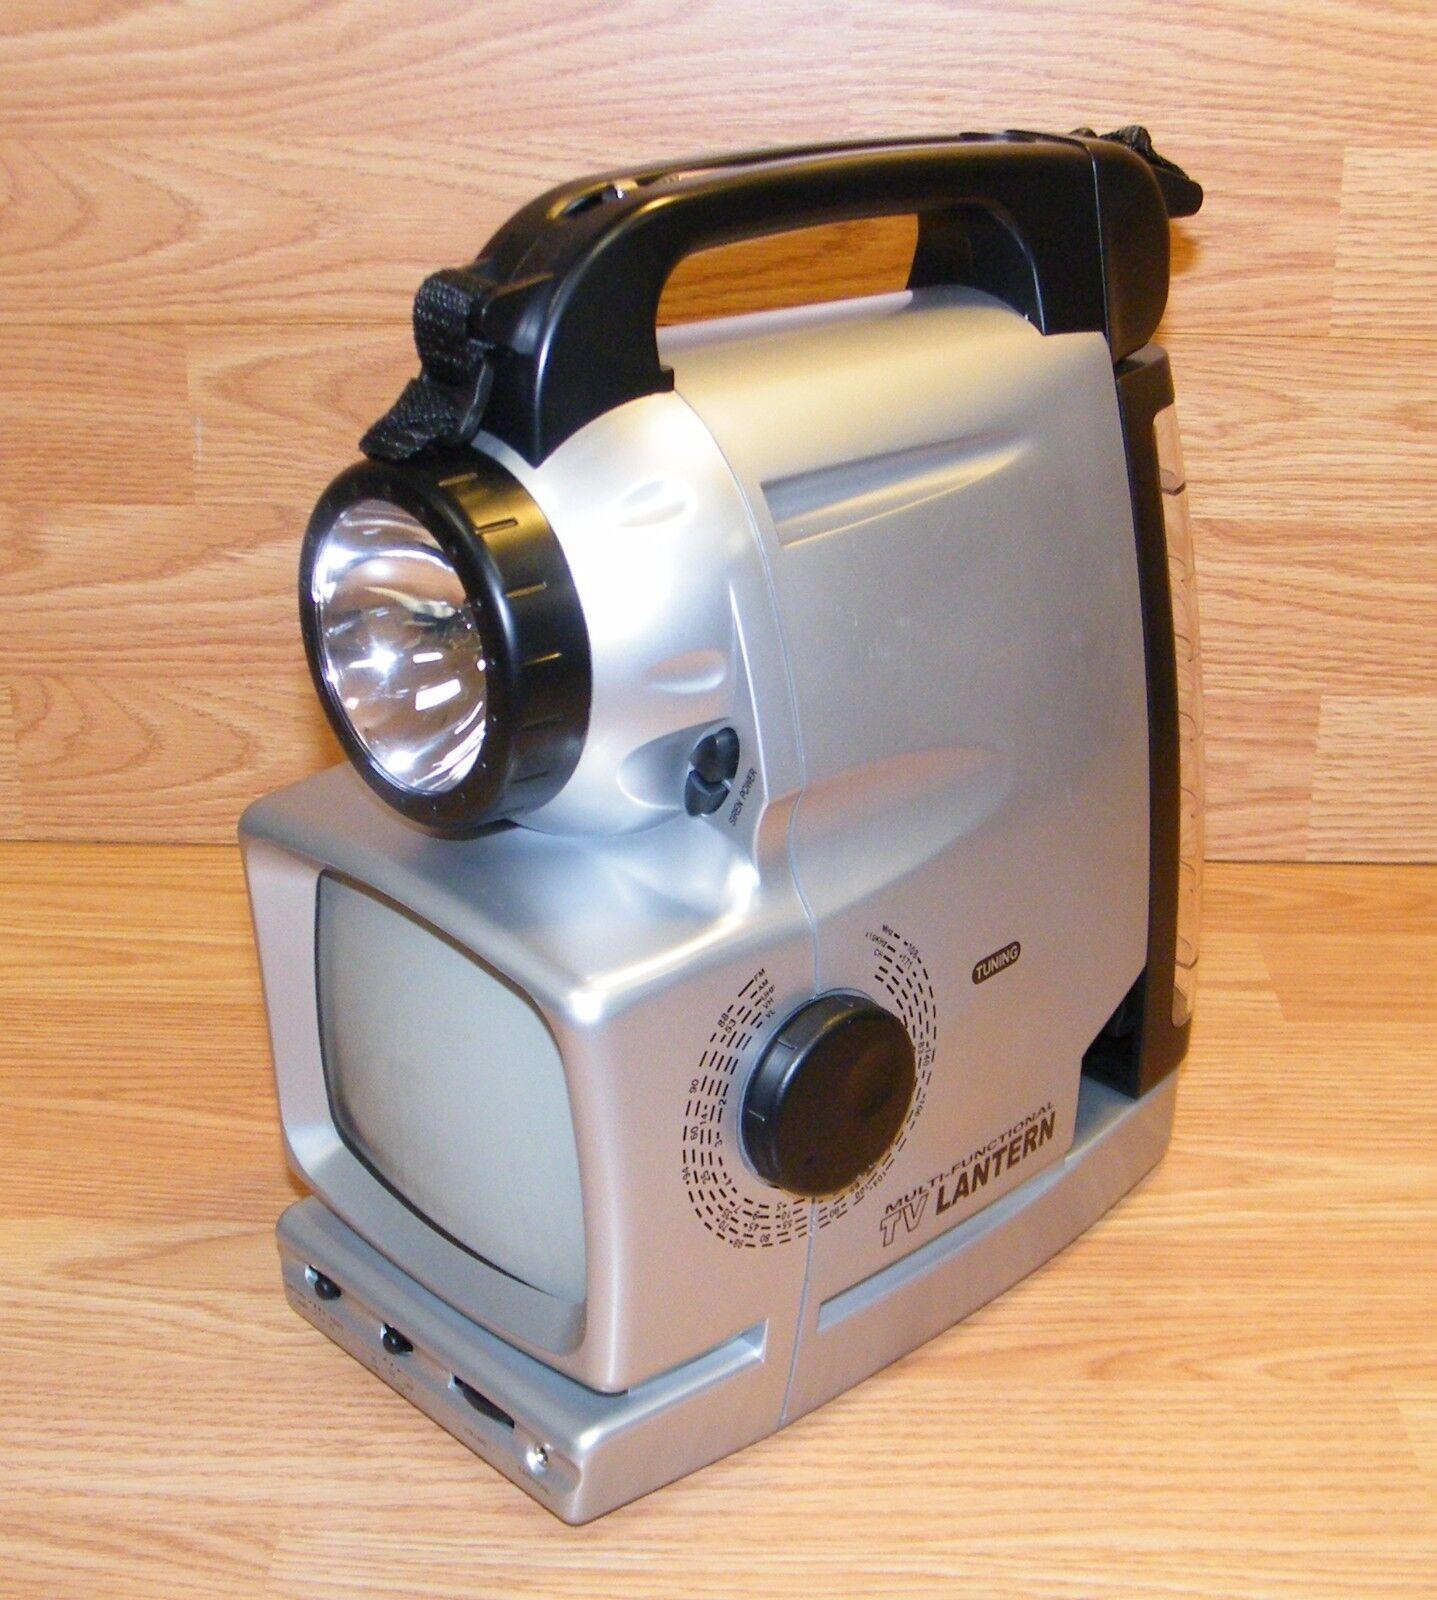 Unbranded (LT631-D)  5 in 1 Multi Functional 5  TV Radio Lantern w  Siren & Flash  not to be missed!